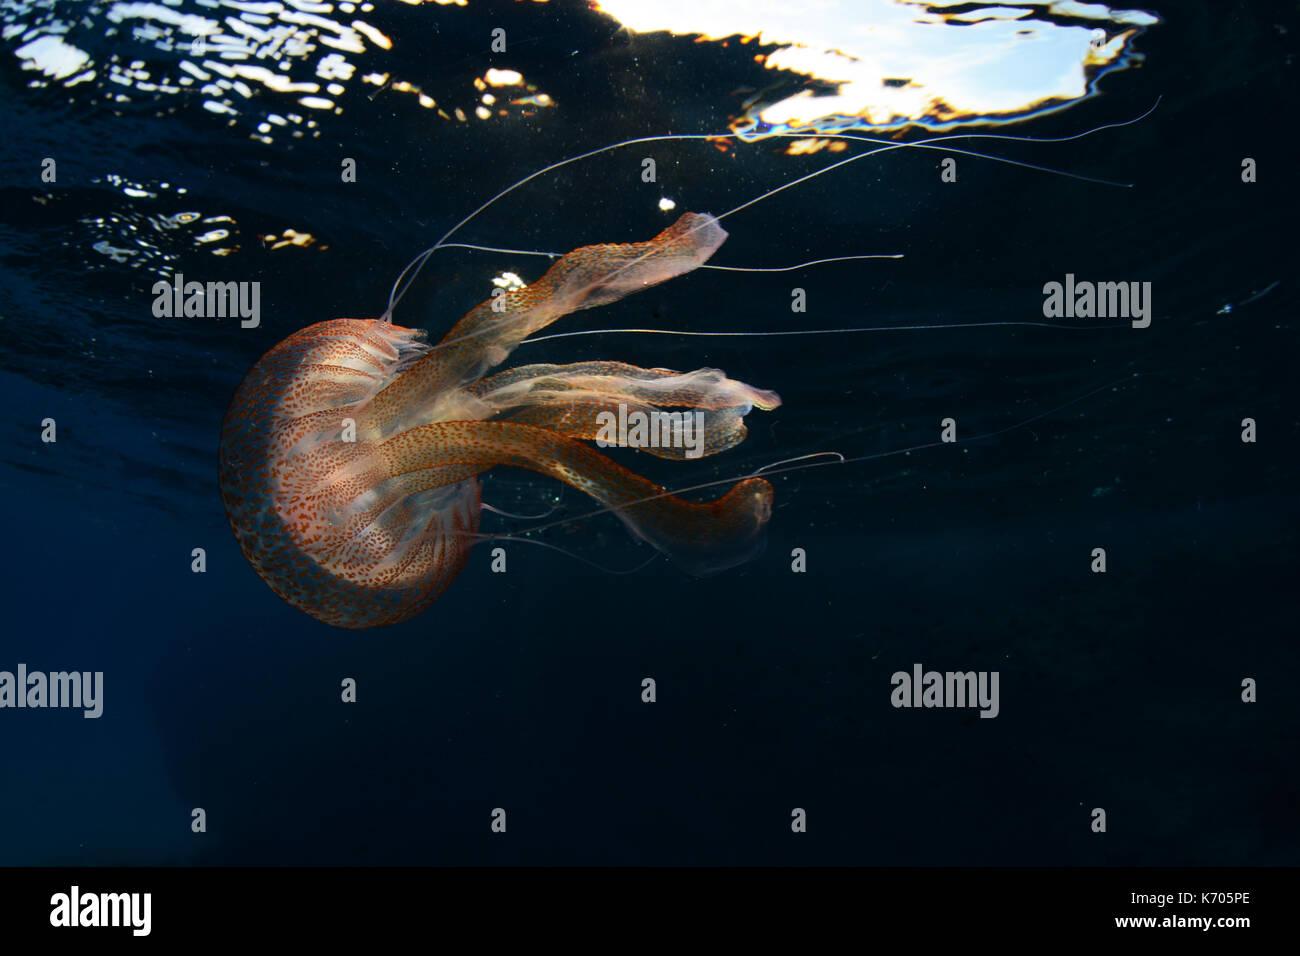 Mauve stinger medusas en Cala Balanca subacuática, Menorca Foto de stock